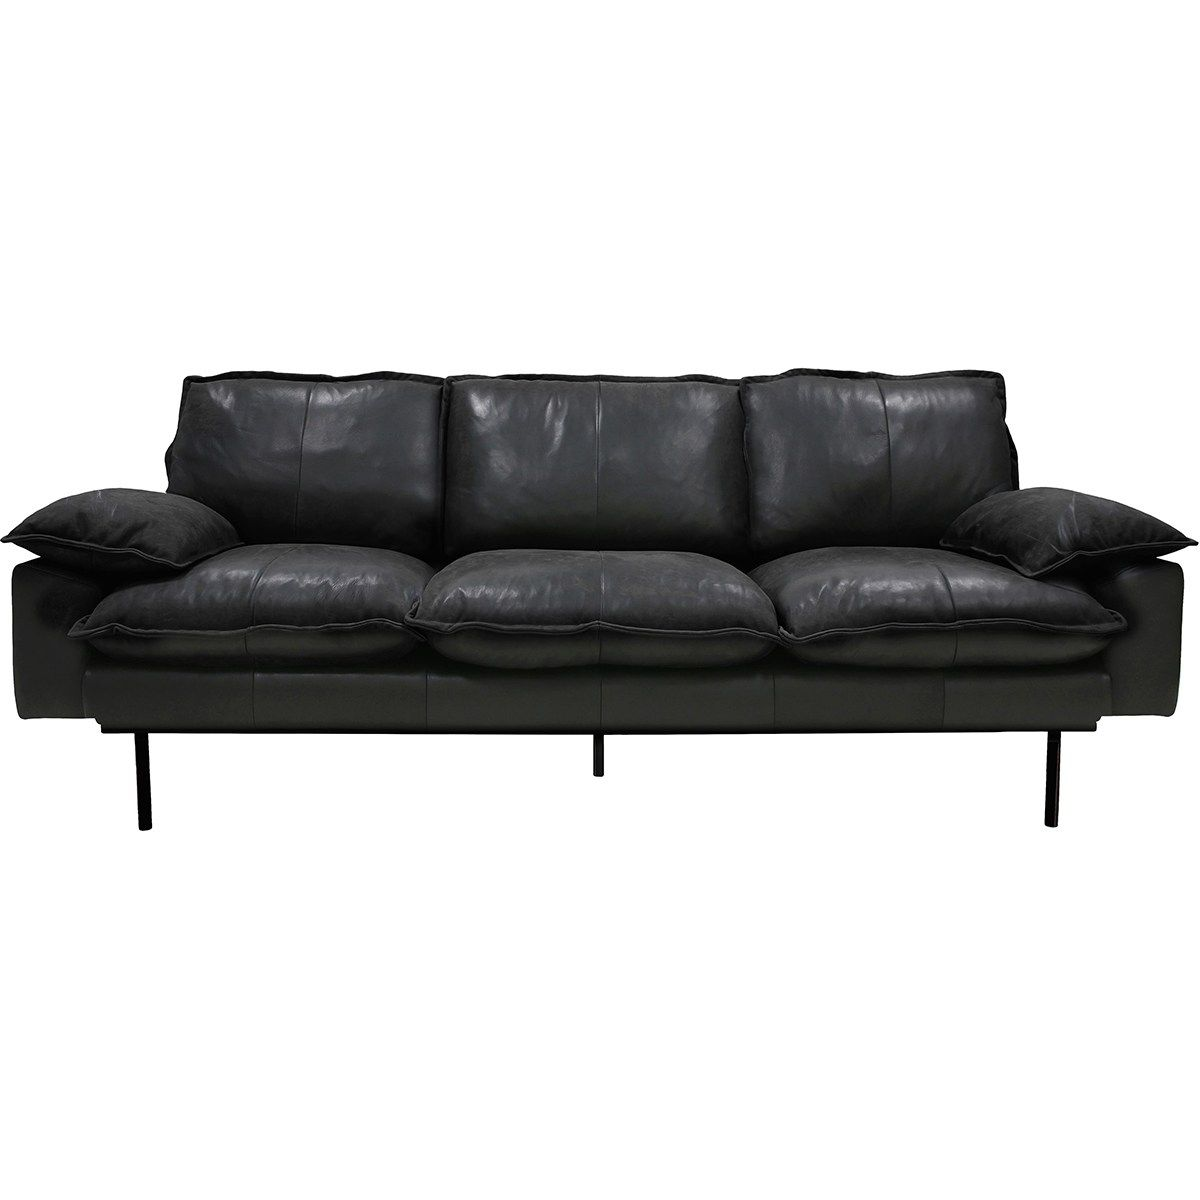 Retro Leather 3 Seater Sofa Retro Sofa Retro Couch Sofa